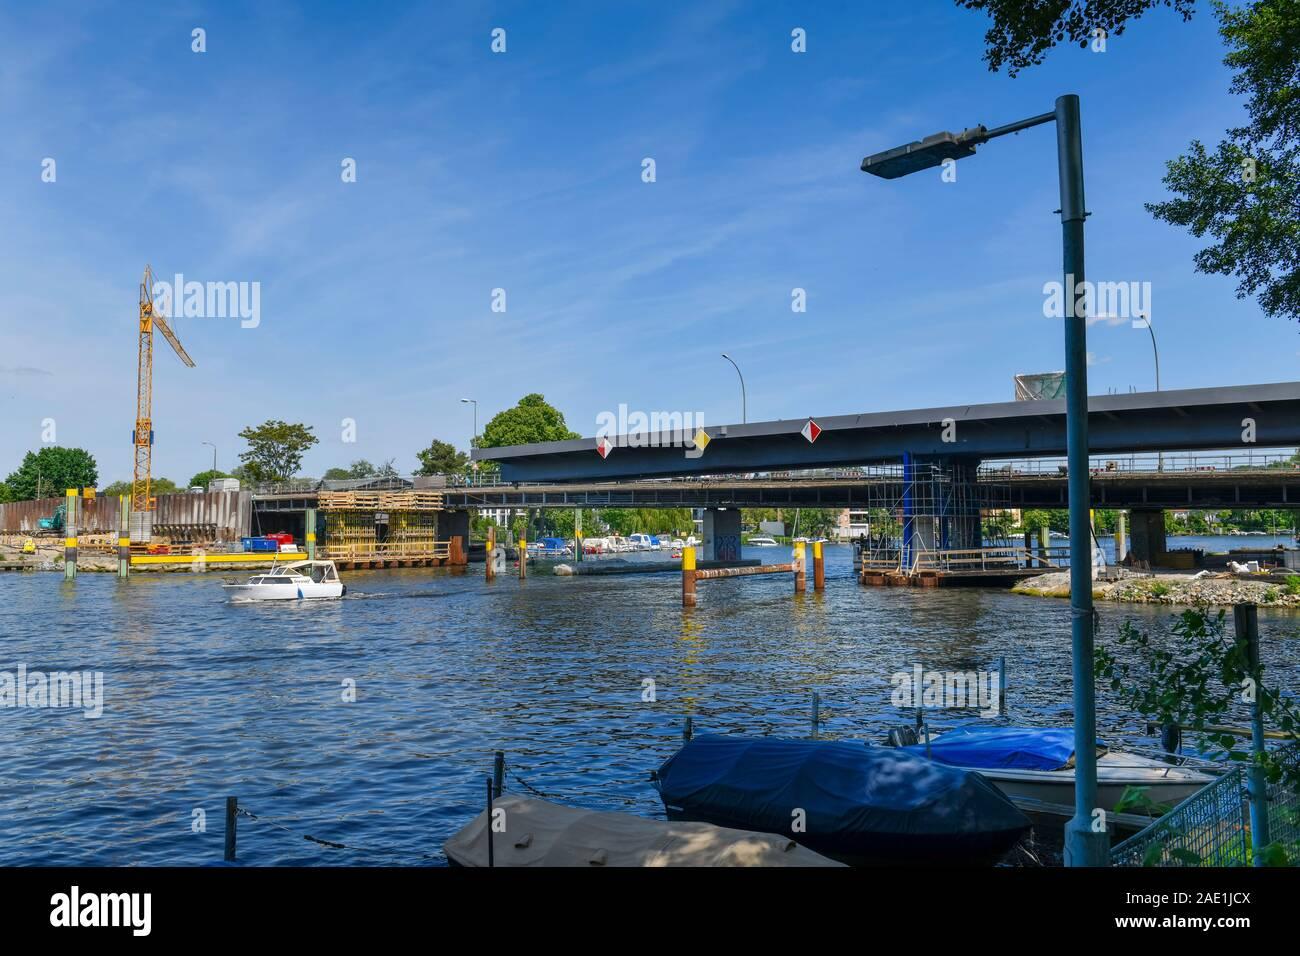 Spree, Salvador-Allende-Brücke, Köpenick, Treptow-Köpenick, Berlín, Alemania Foto de stock